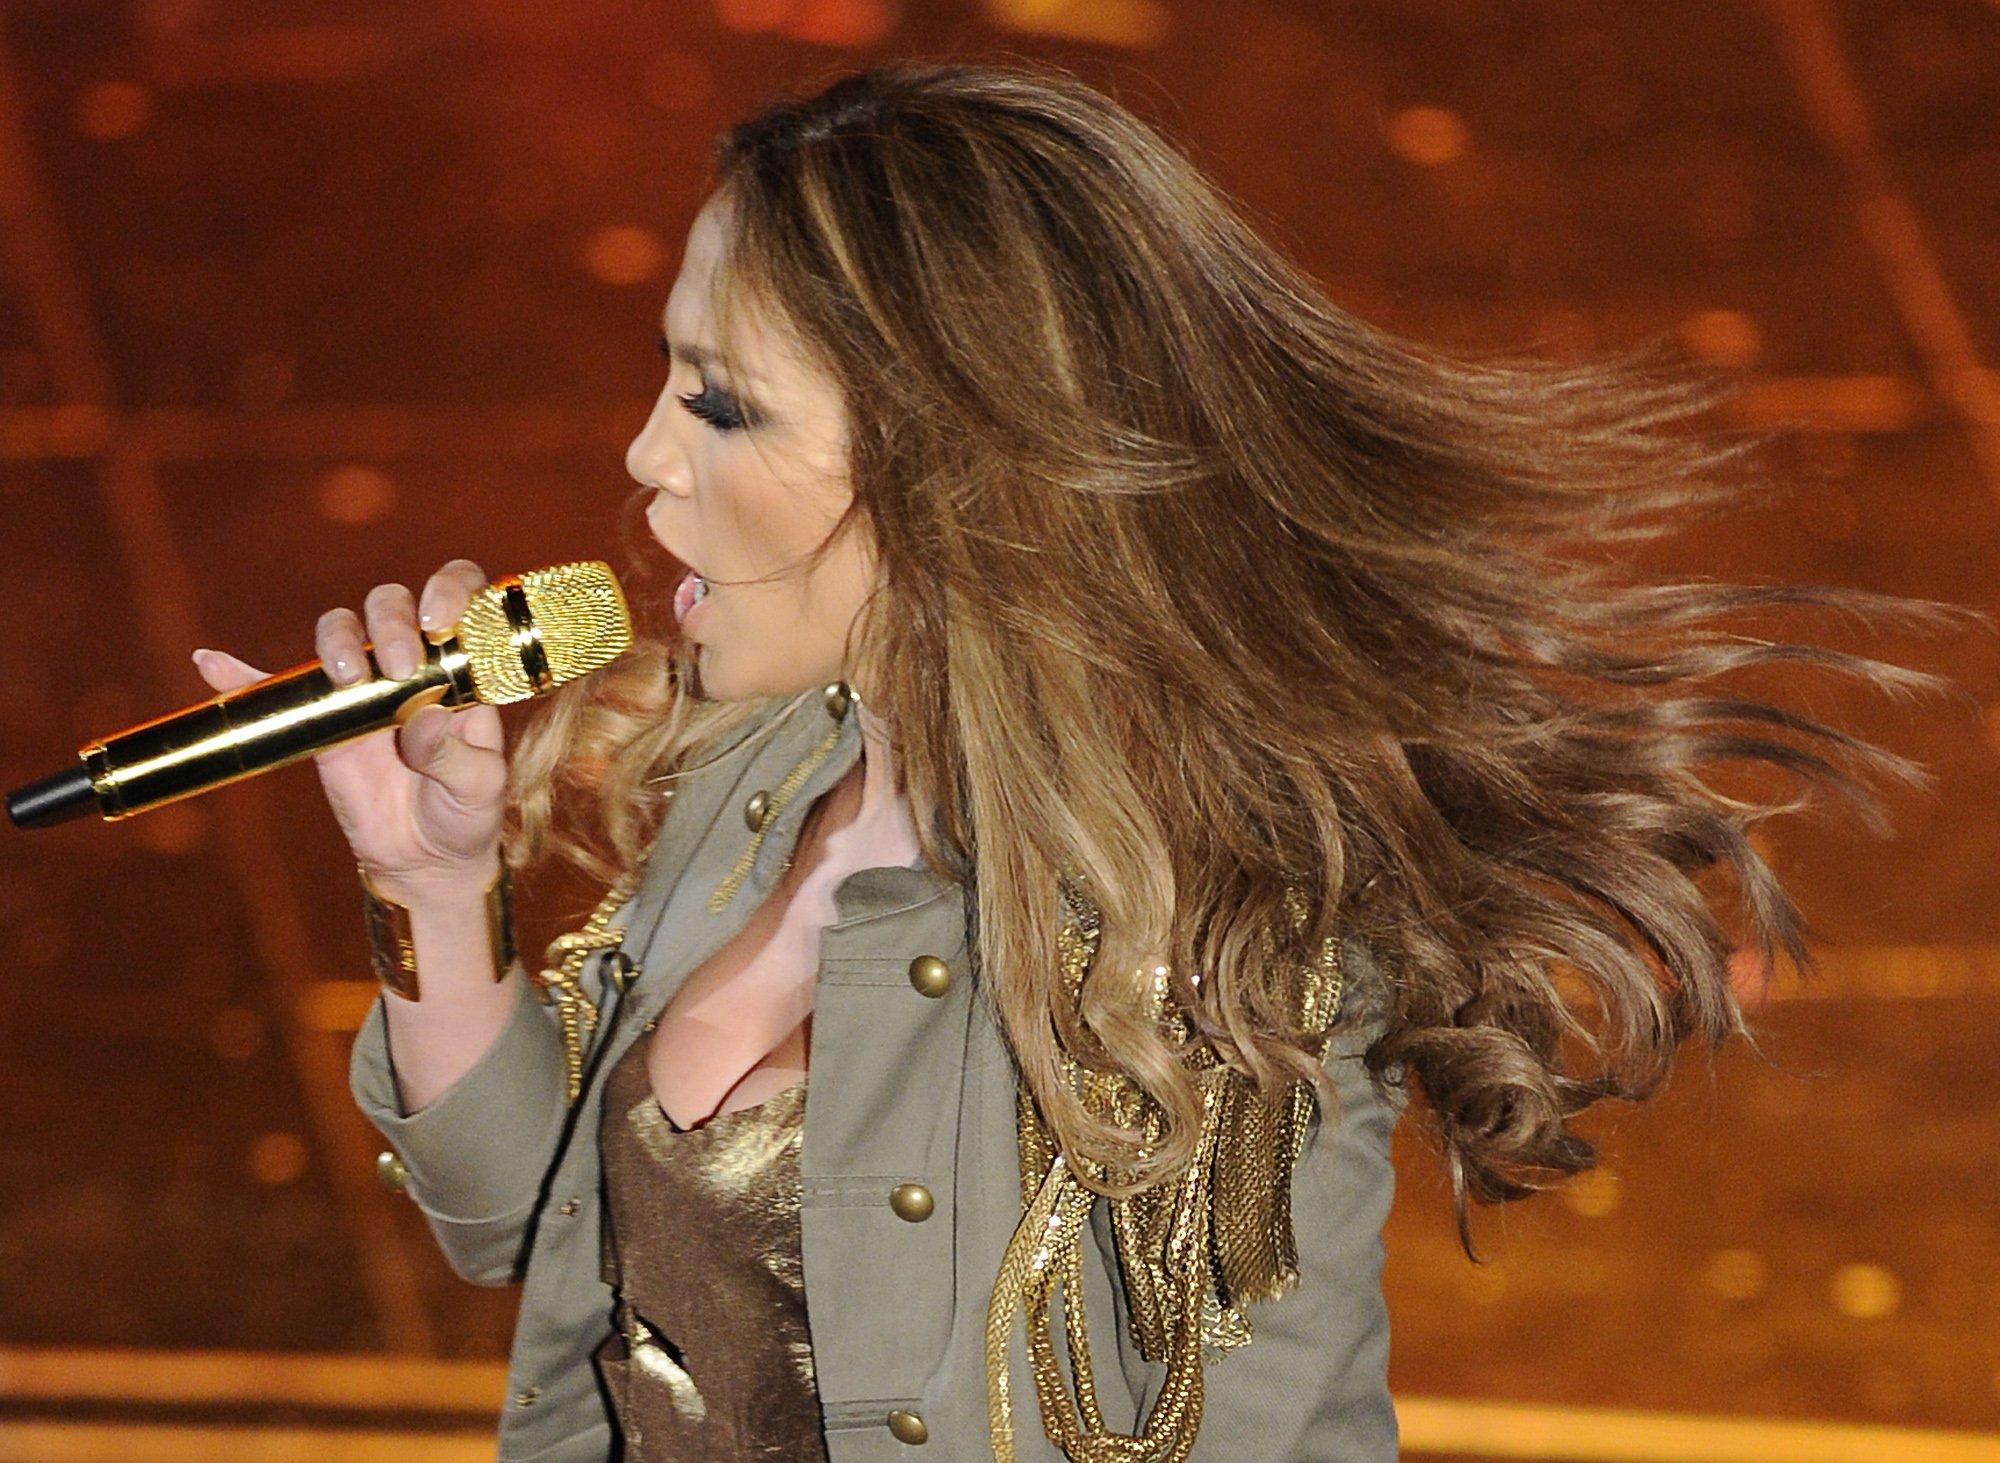 74647_Jennifer_Lopez_performs_during_the_Festival_di_Sanremo_Italian_song_contest-3_122_152lo.jpg